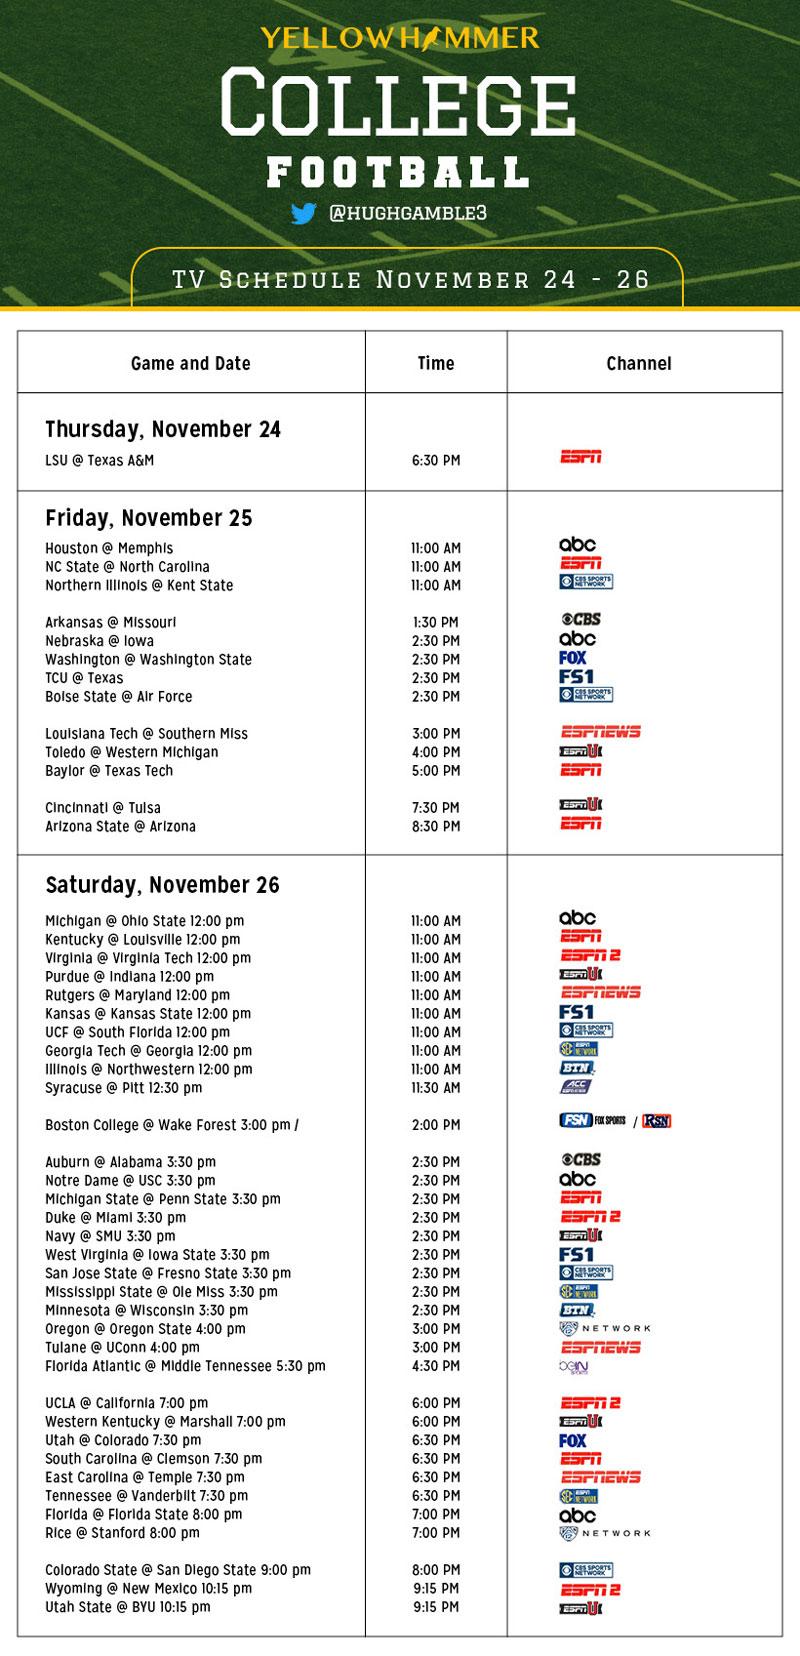 week 11 college football schedule sbr forum college football